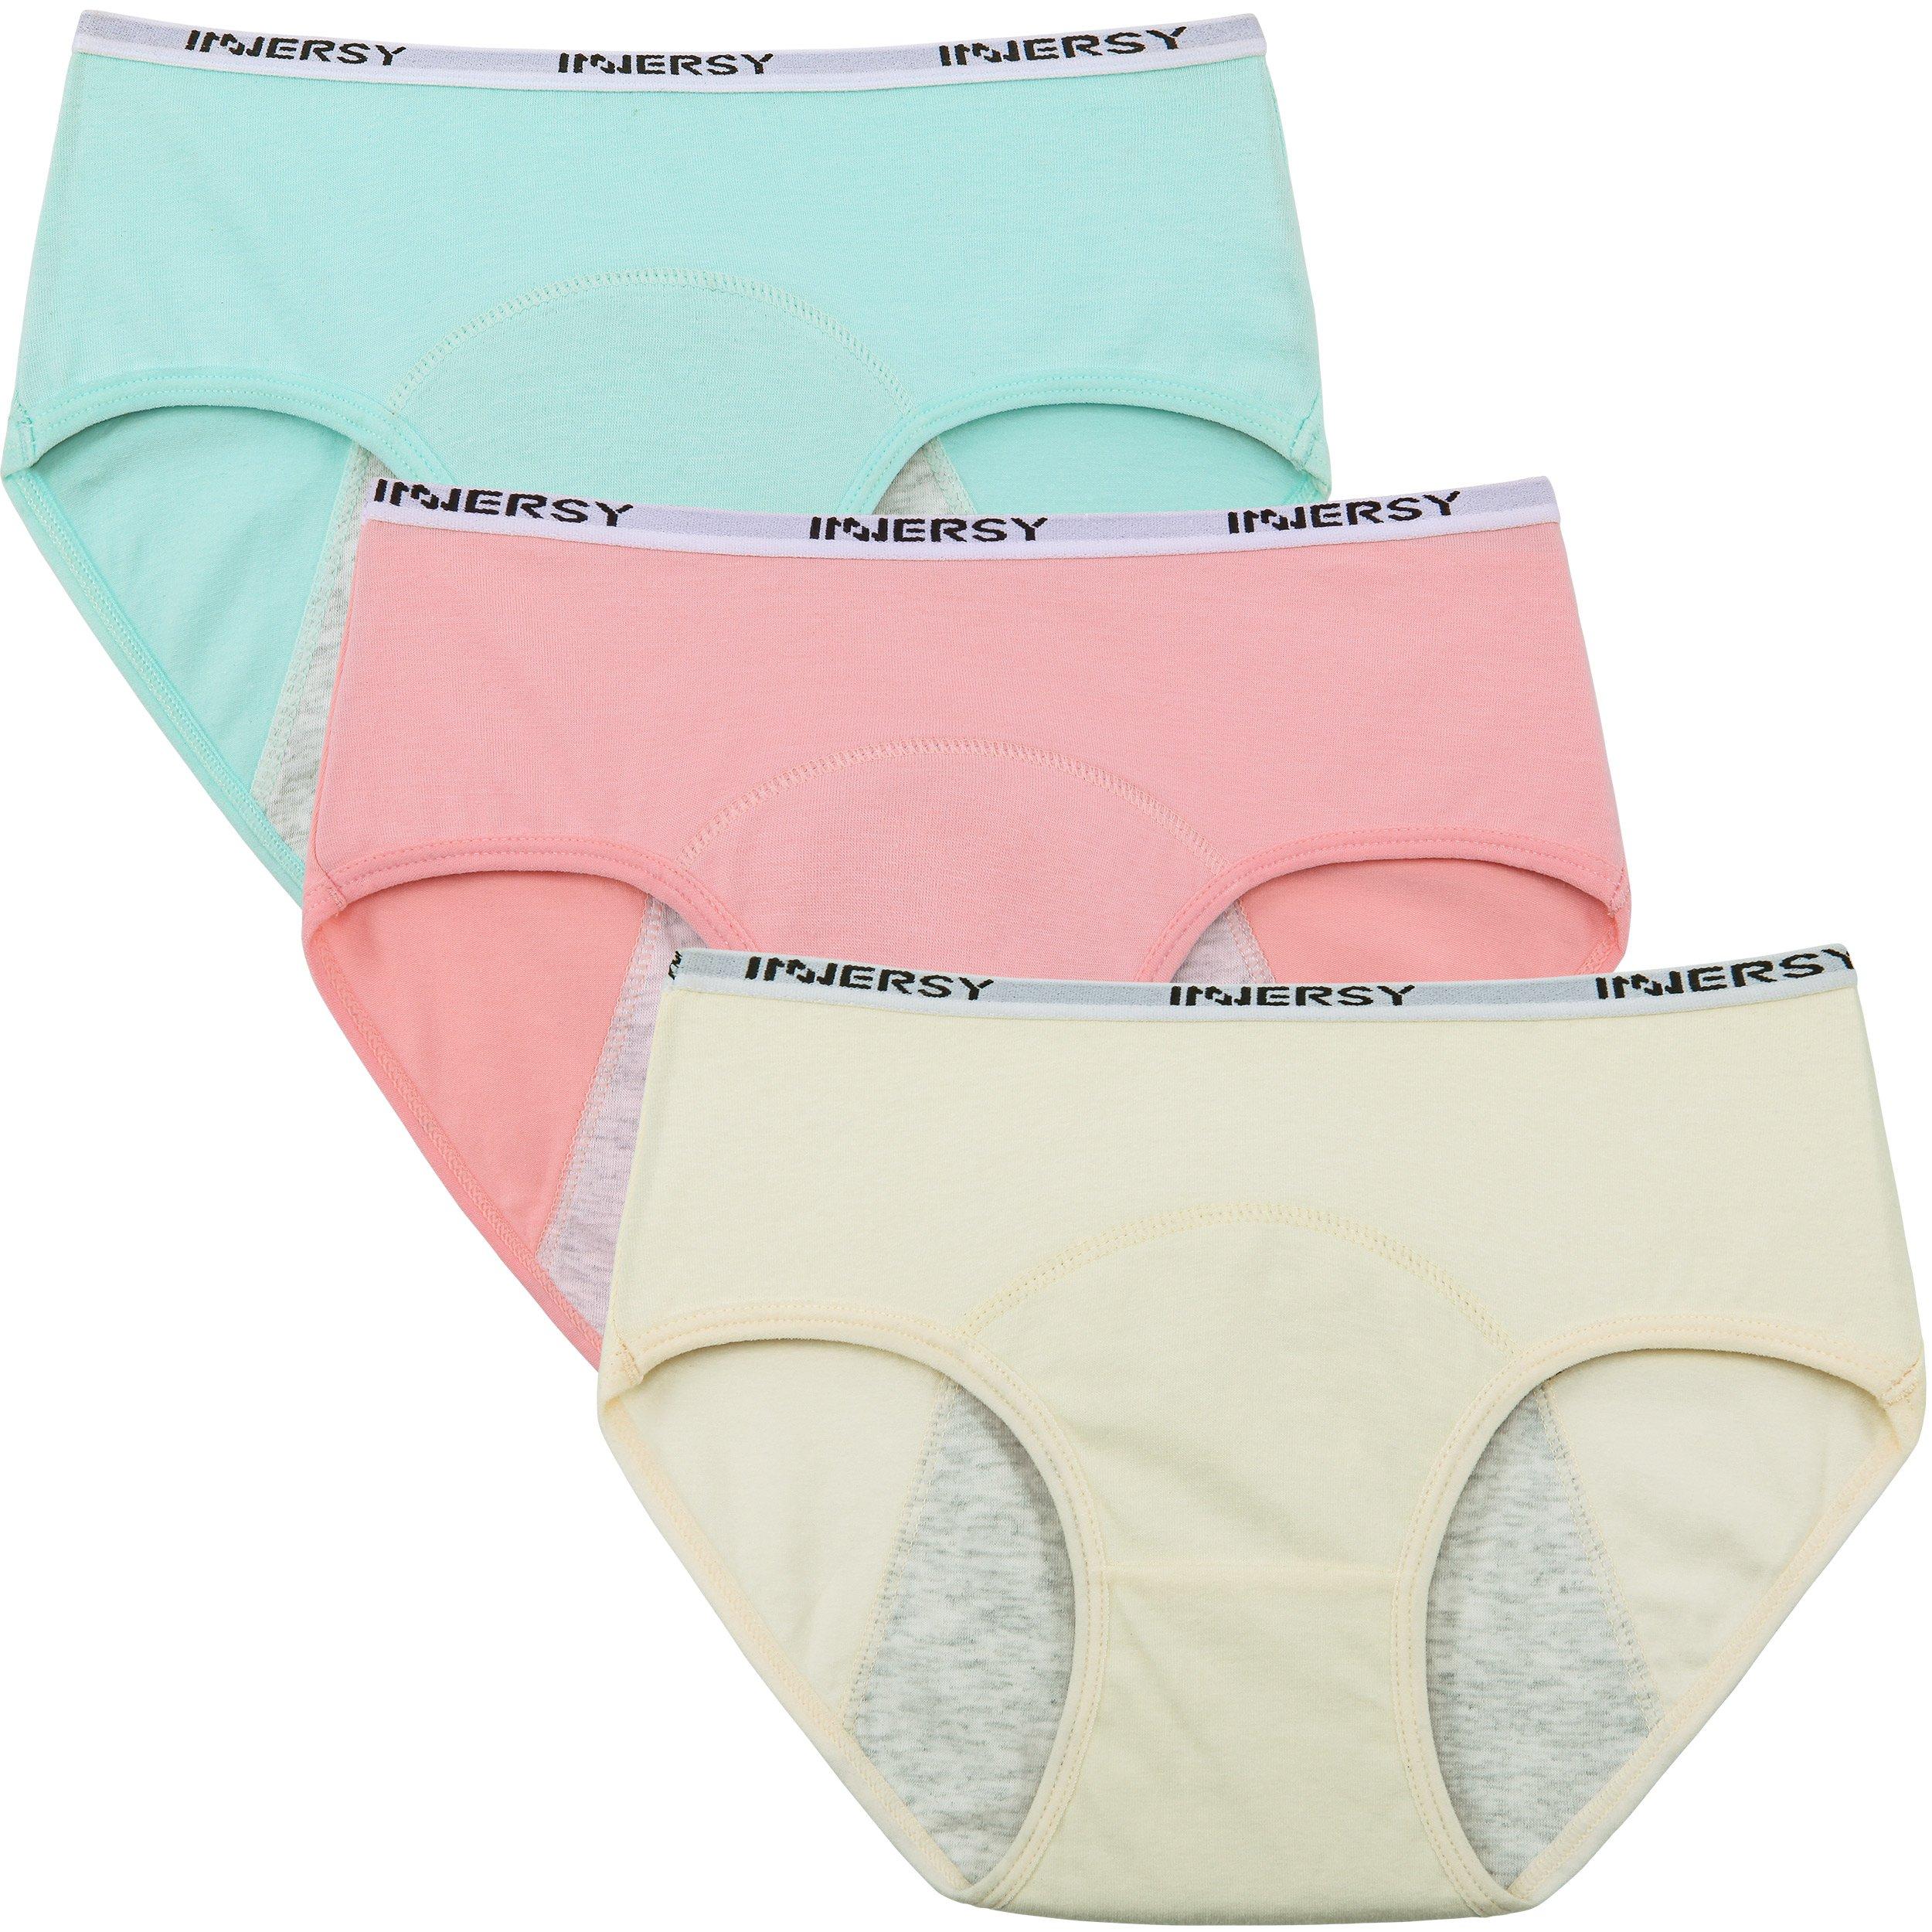 Innersy Big Girl Menstrual Period Hipster Panties Leakproof Sanitary Underwear for Teen(X-Large, Solid 1)